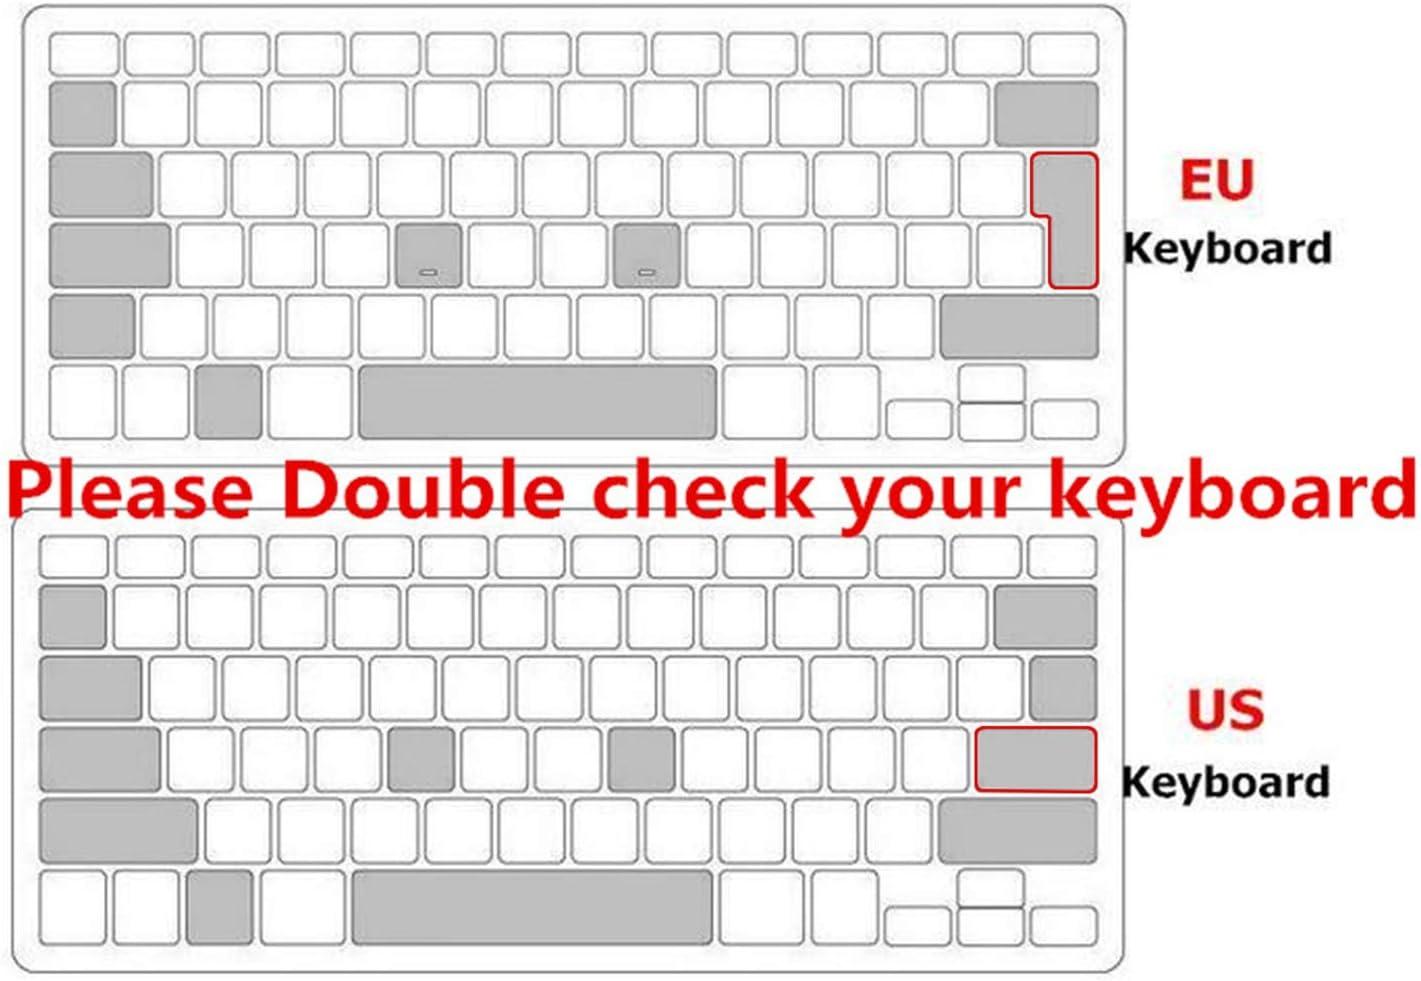 UK//EU ESP Slim Spanish Gradient Silicone Keyboard Cover Keypad Skin Protector Compatible for Mac Book Air Pro Retina 13